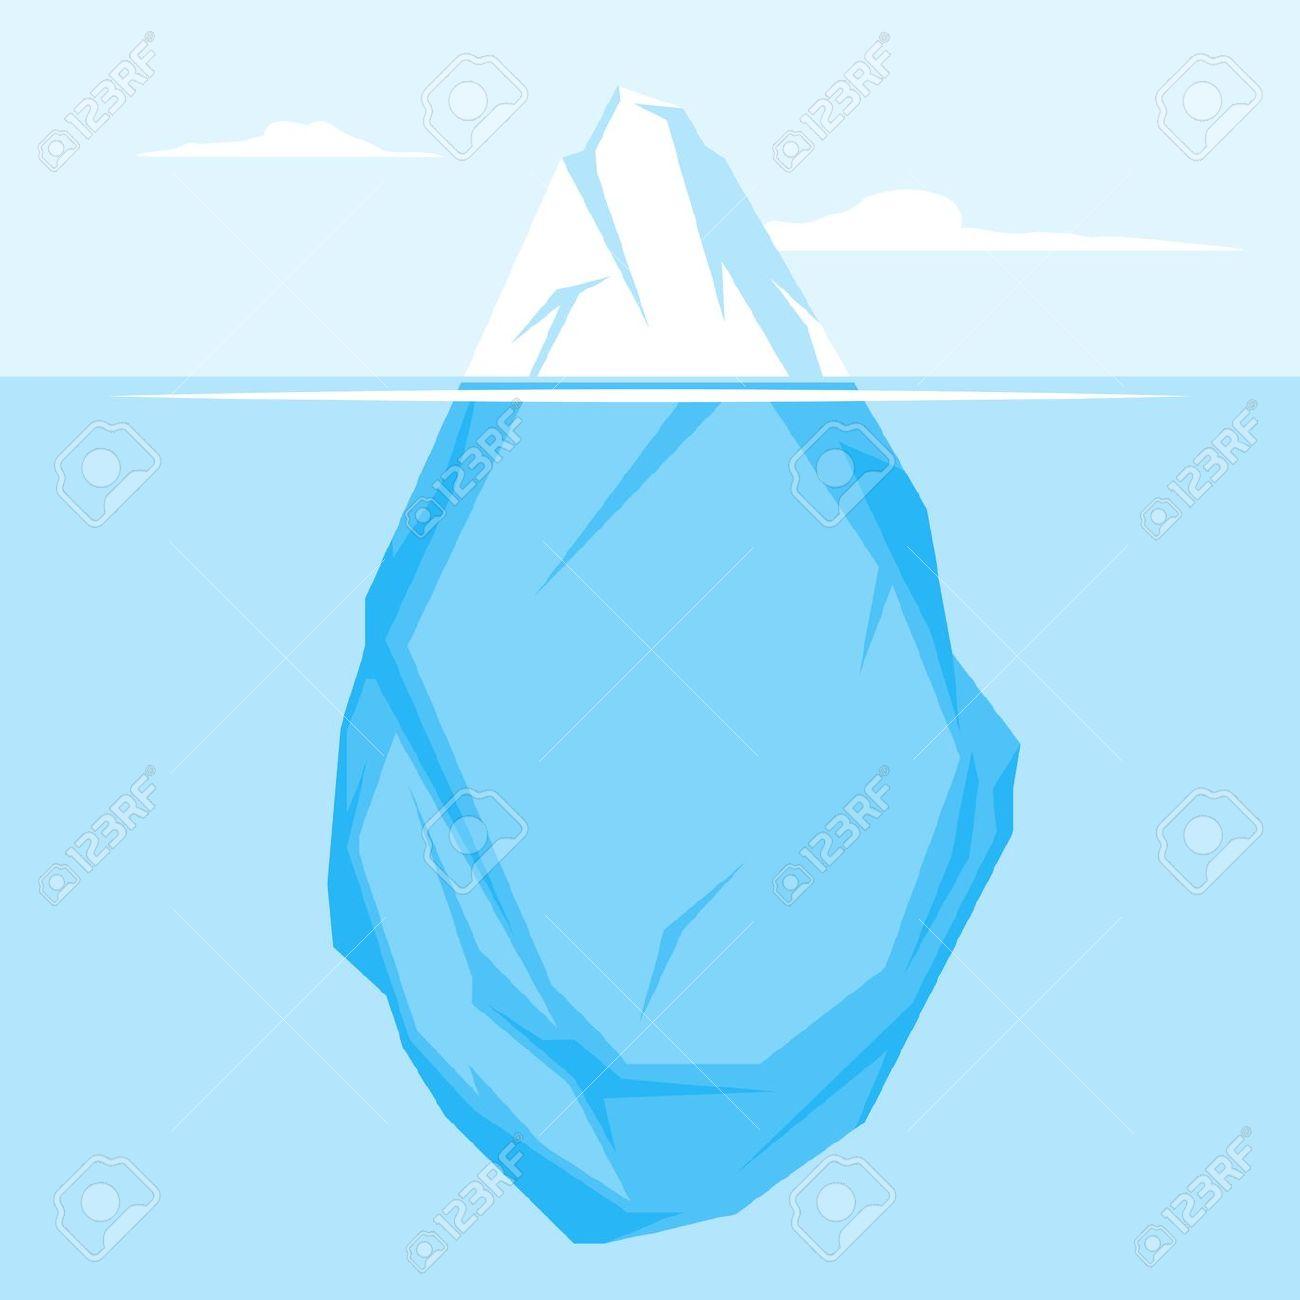 Flat iceberg clipart.